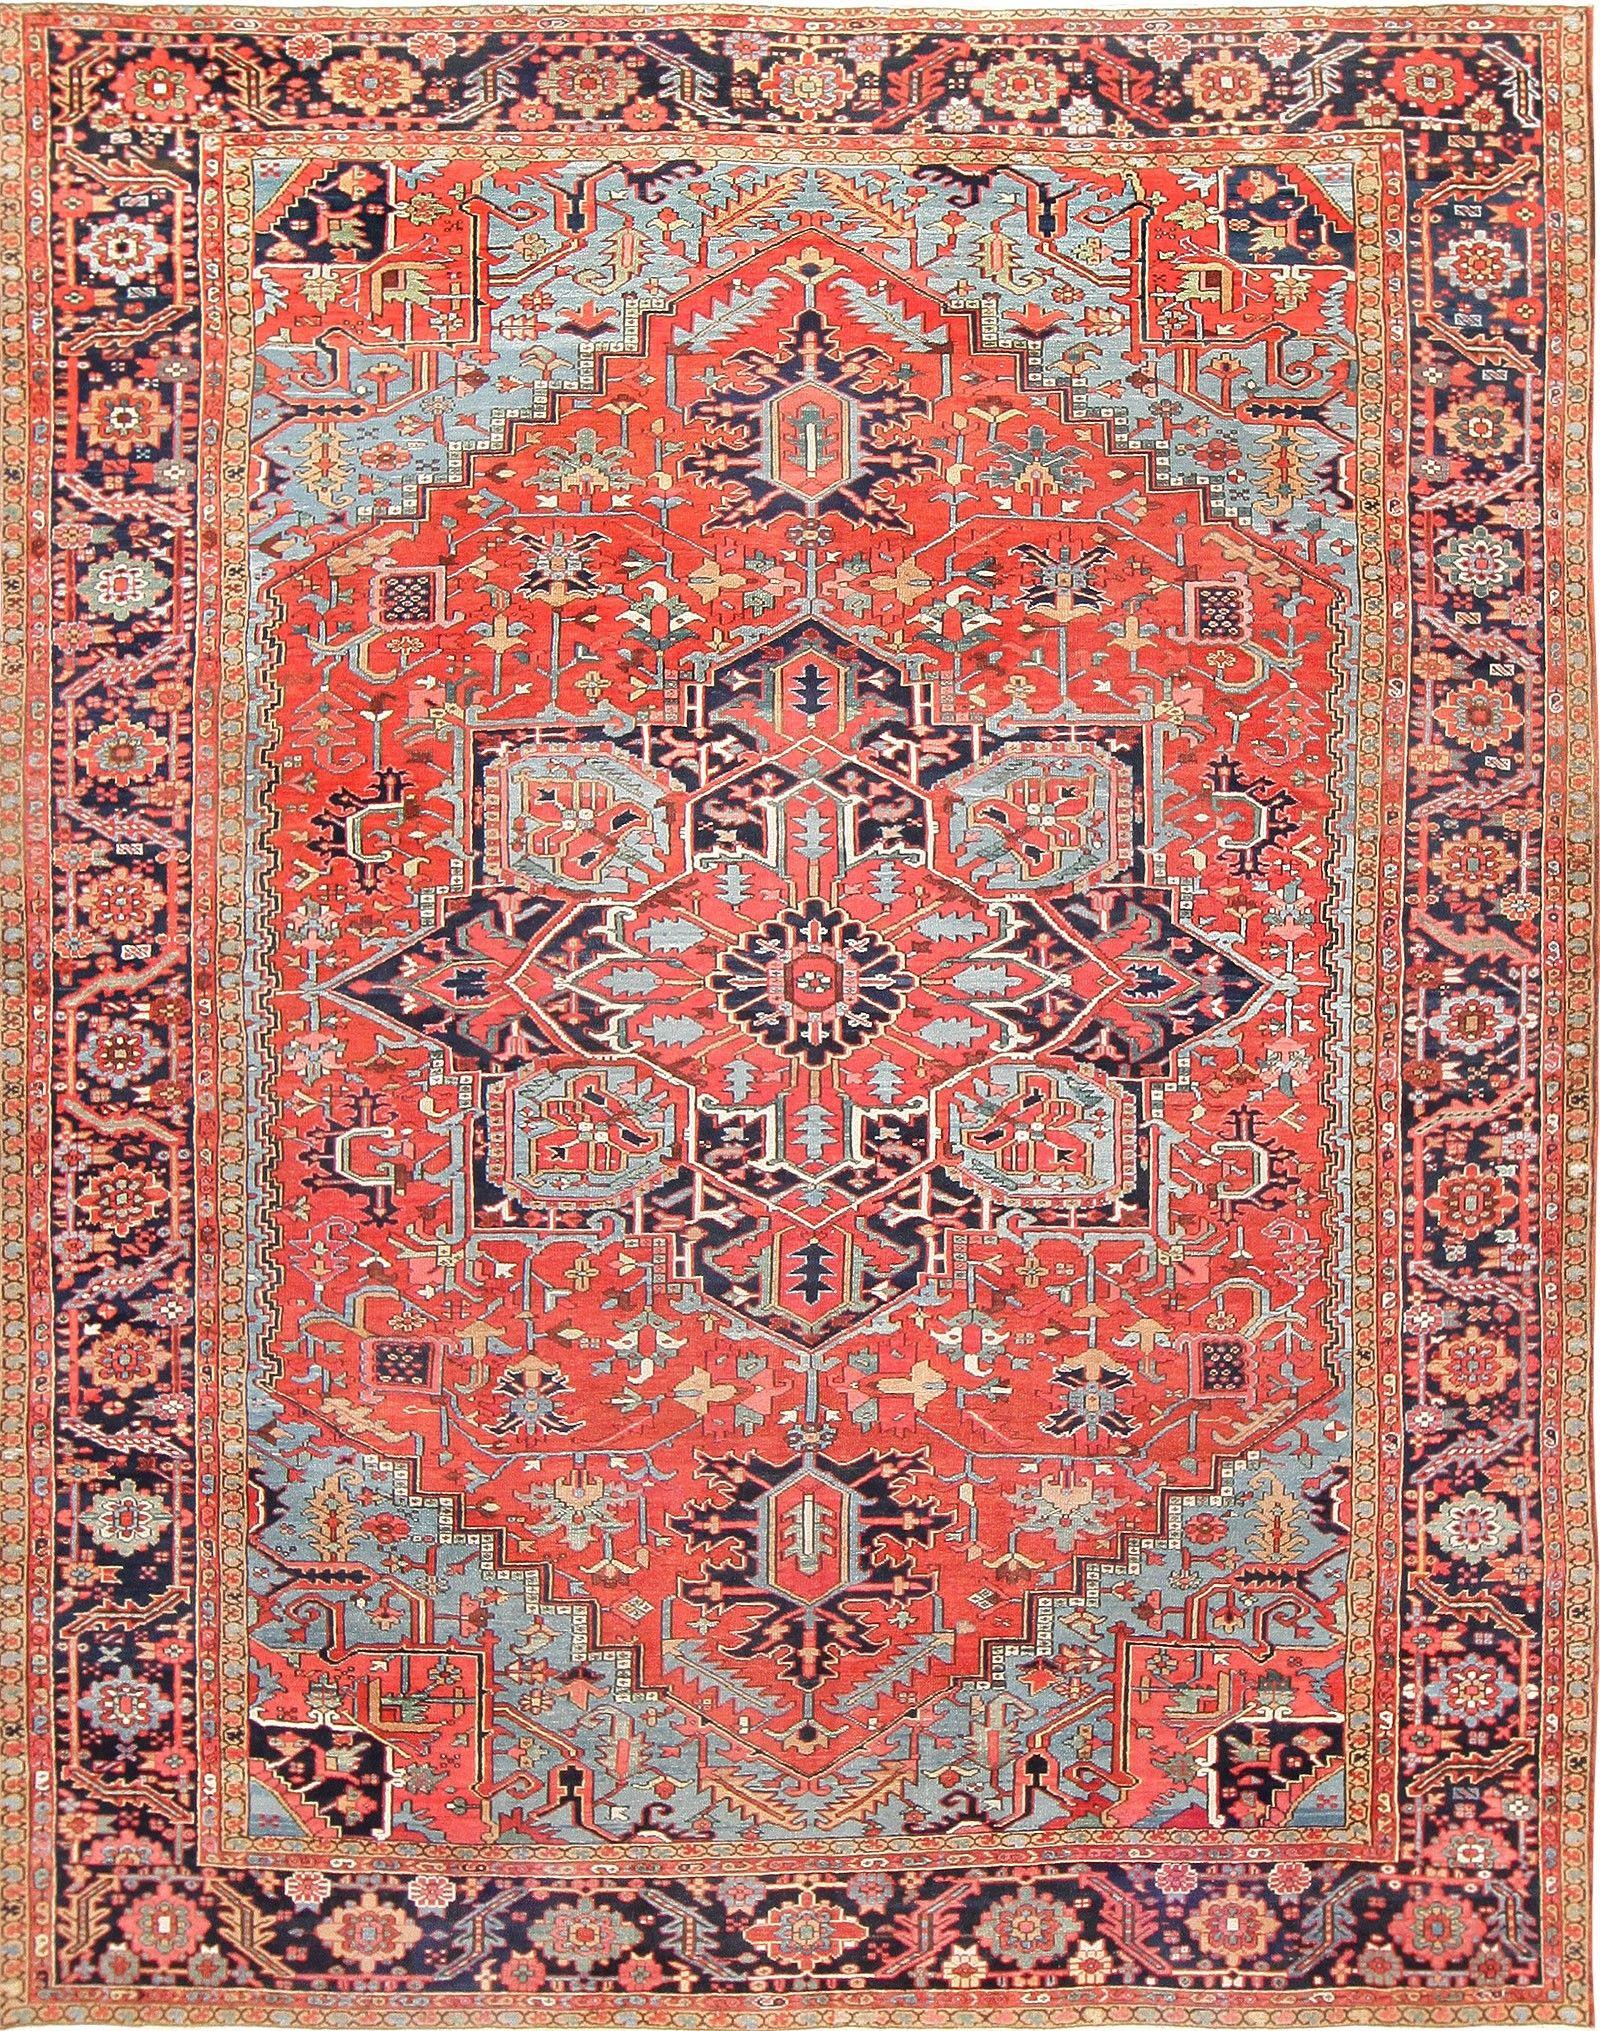 Large Antique Persian Heriz Serapi Carpet 47519 Main Image